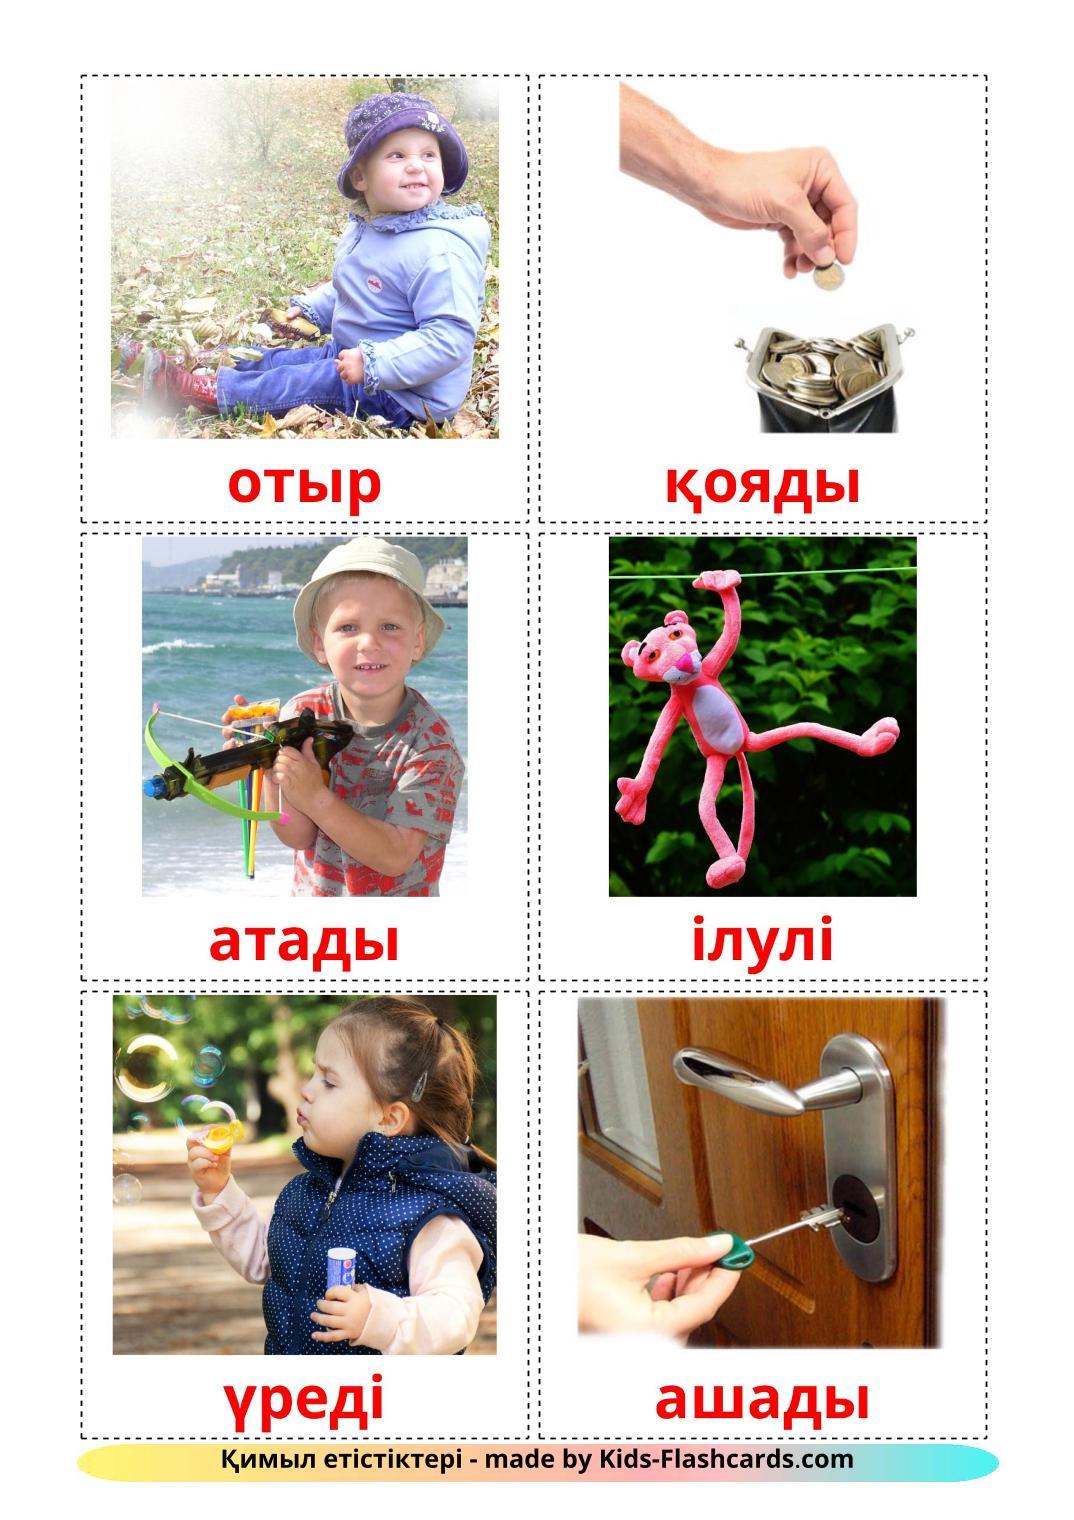 Action verbs - 55 Free Printable kazakh Flashcards